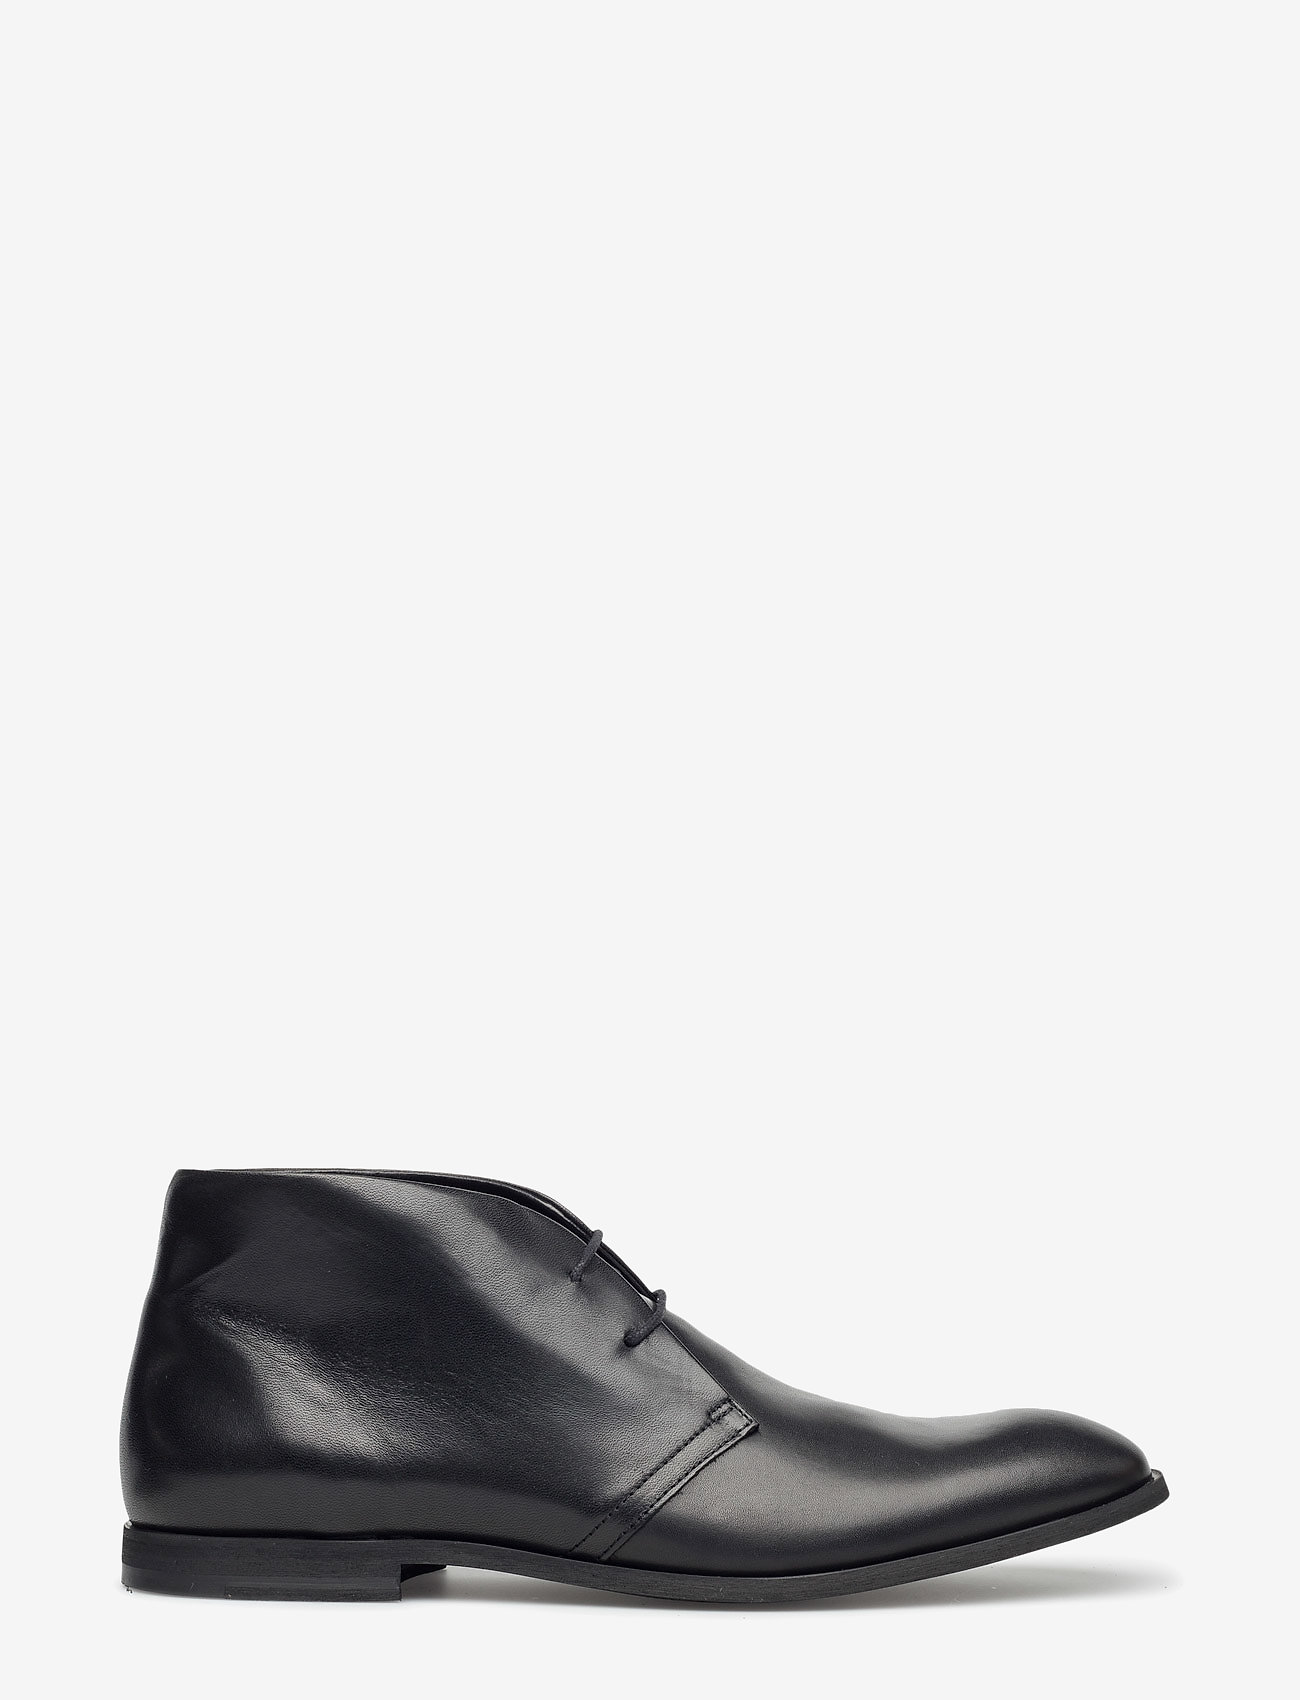 Lindbergh - Leather boot - desert boots - black - 1